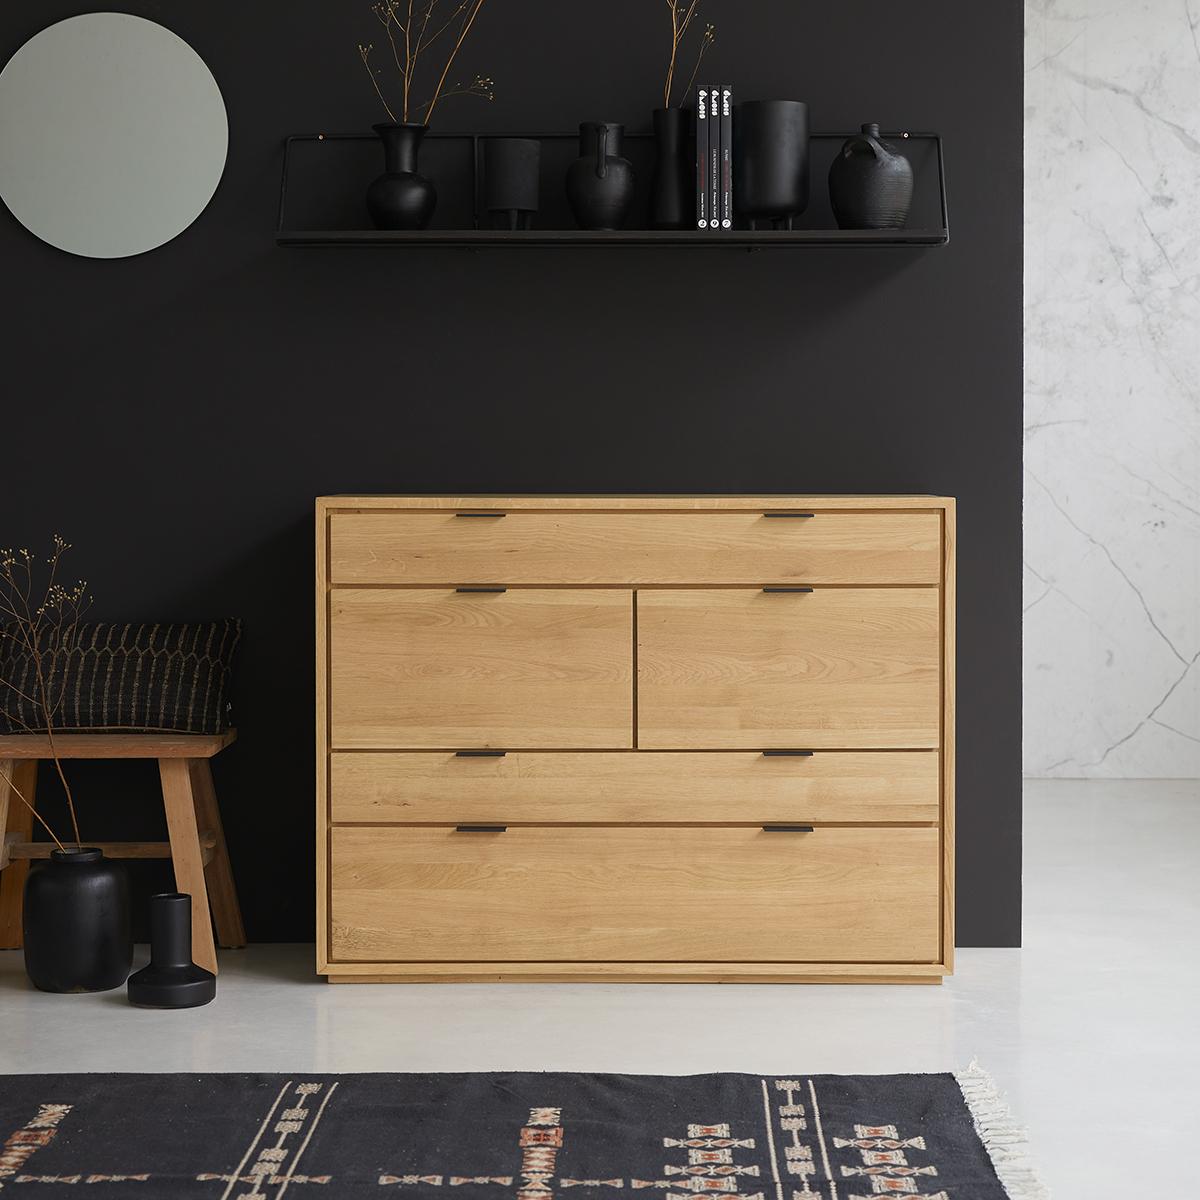 Senson solid oak Chest of drawers